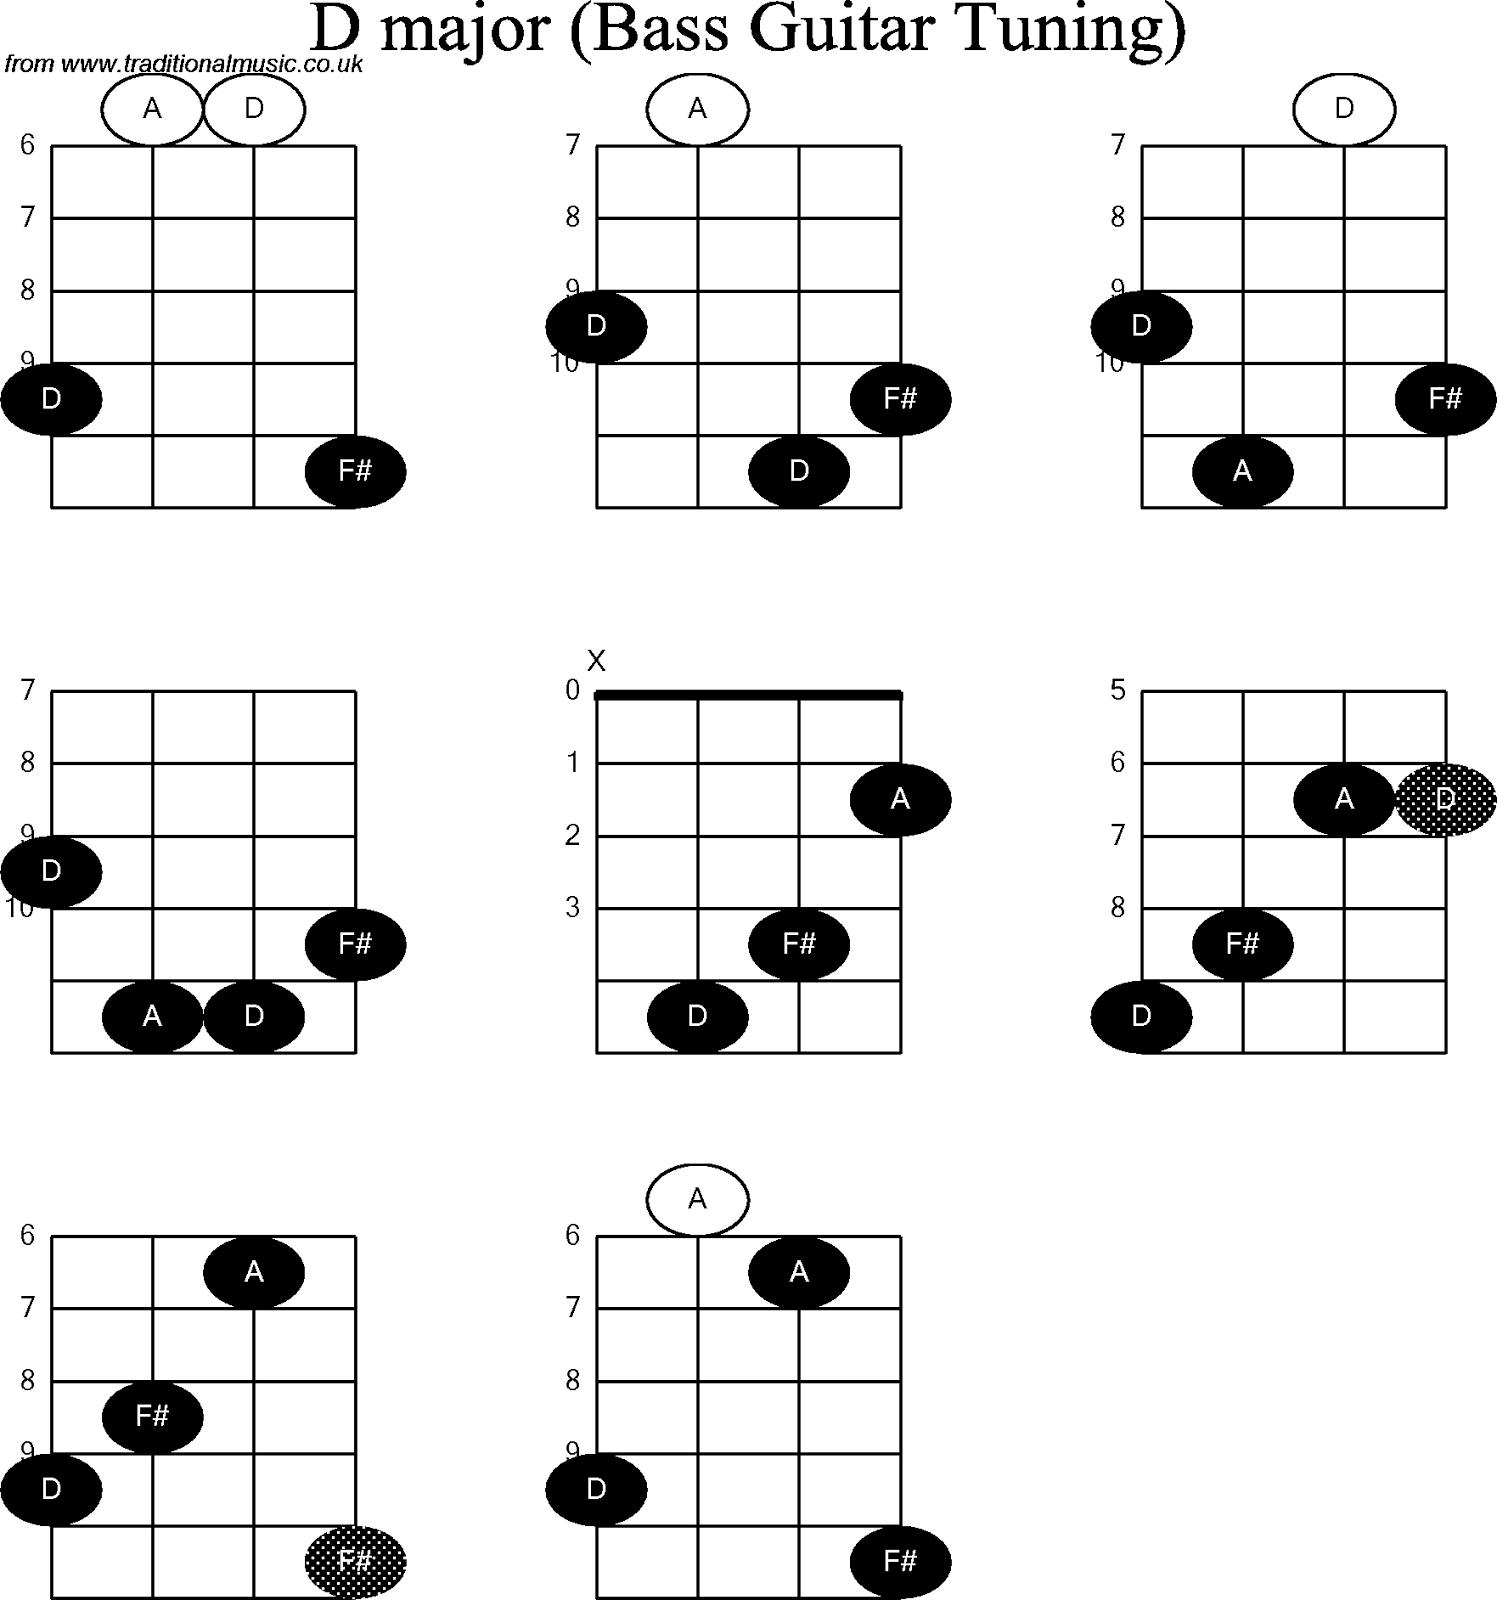 Gambar Kunci Gitar Bass Chords Lengkap